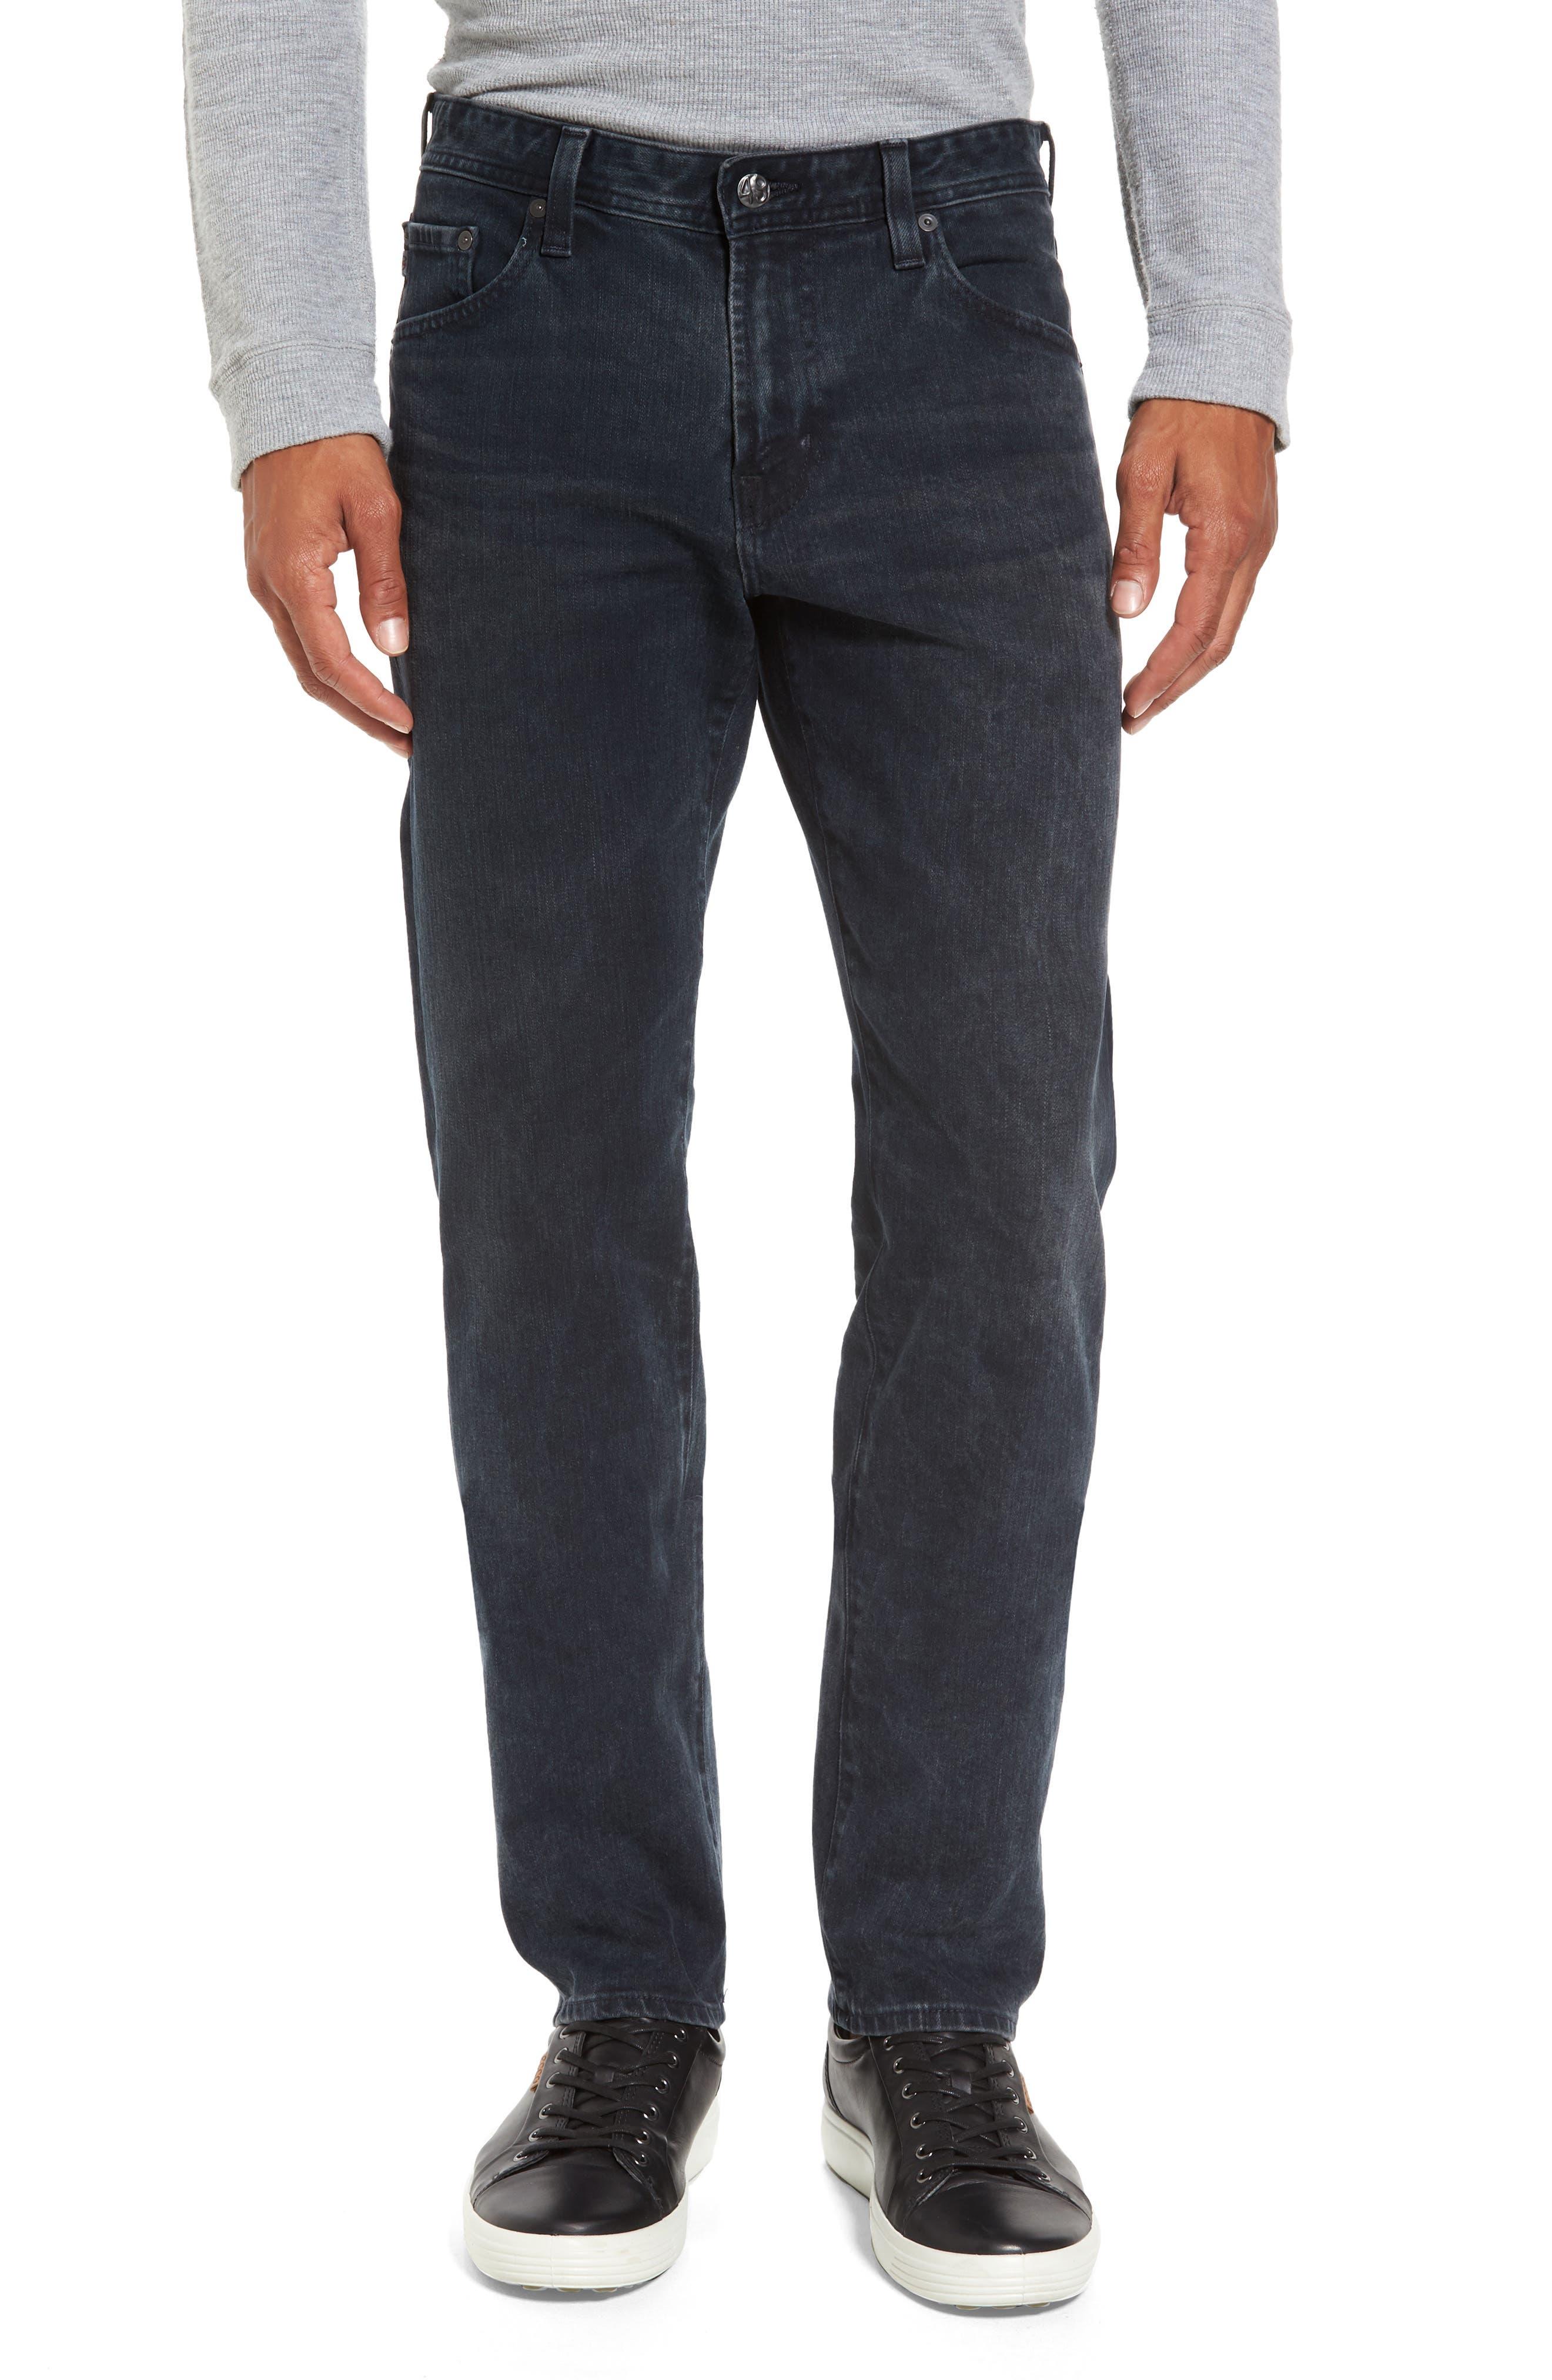 Graduate Slim Straight Leg Jeans,                         Main,                         color, 6 Years Night Scene